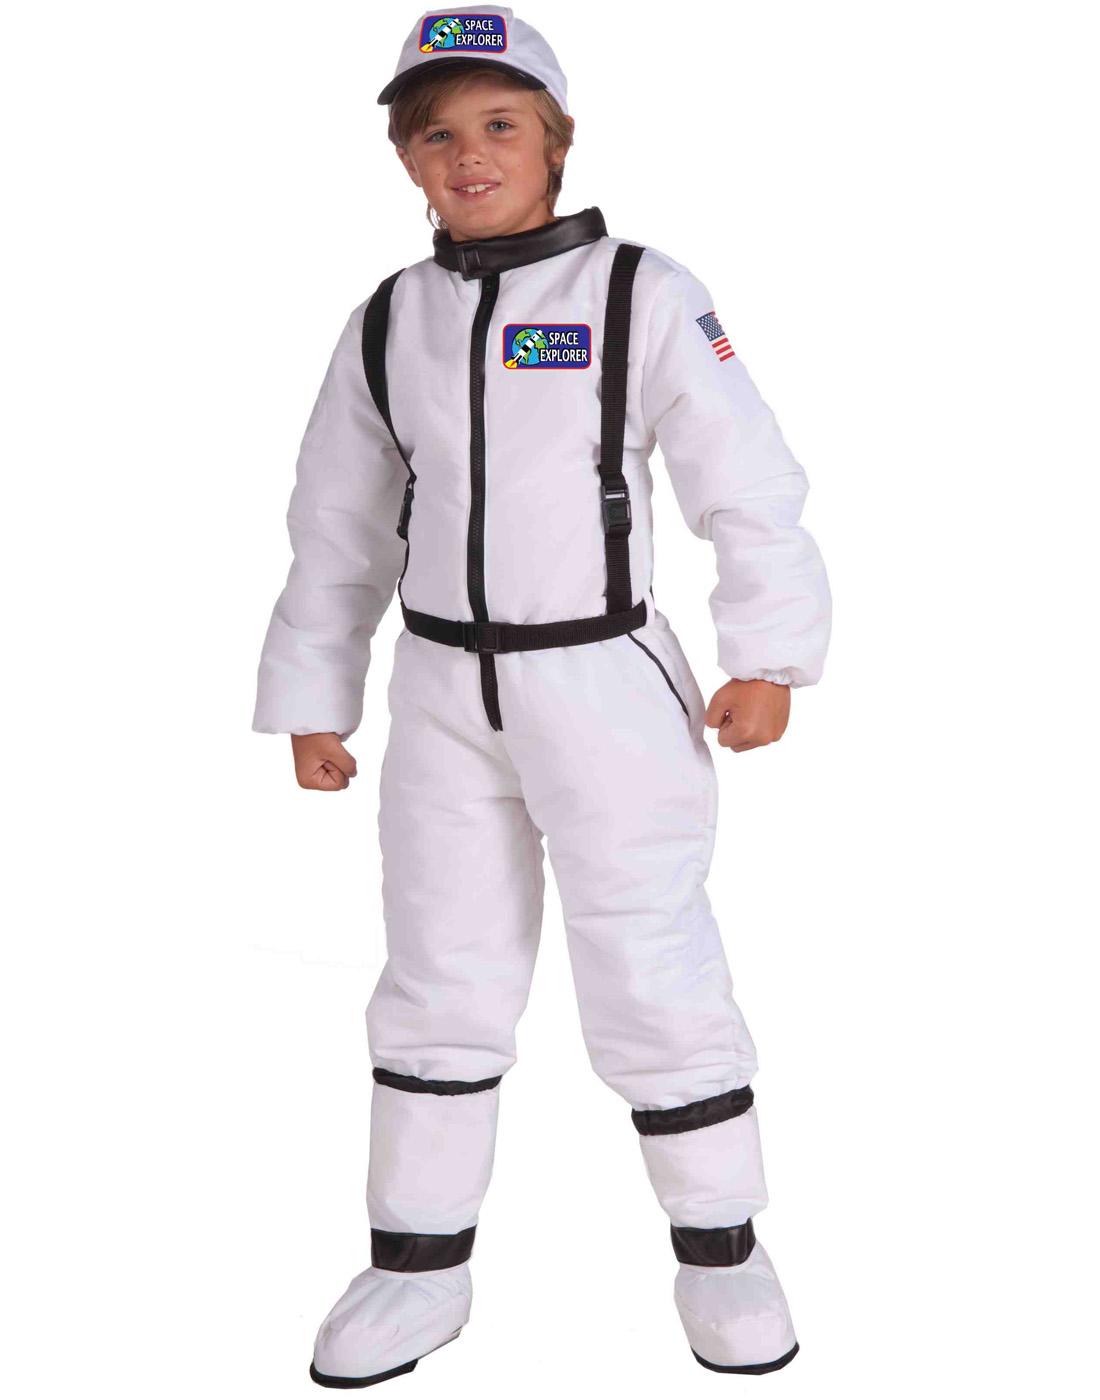 Brand New Astronaut Space Explorer Adult Costume